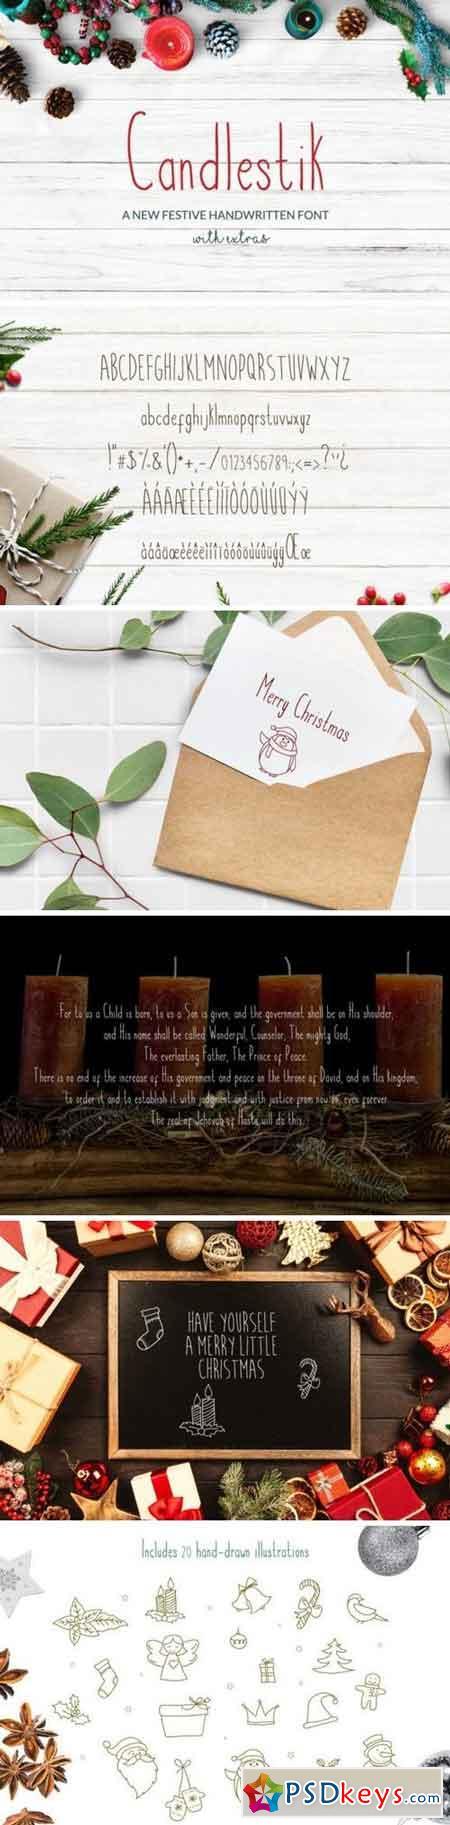 Candlestik Christmas Font & Extras 168943